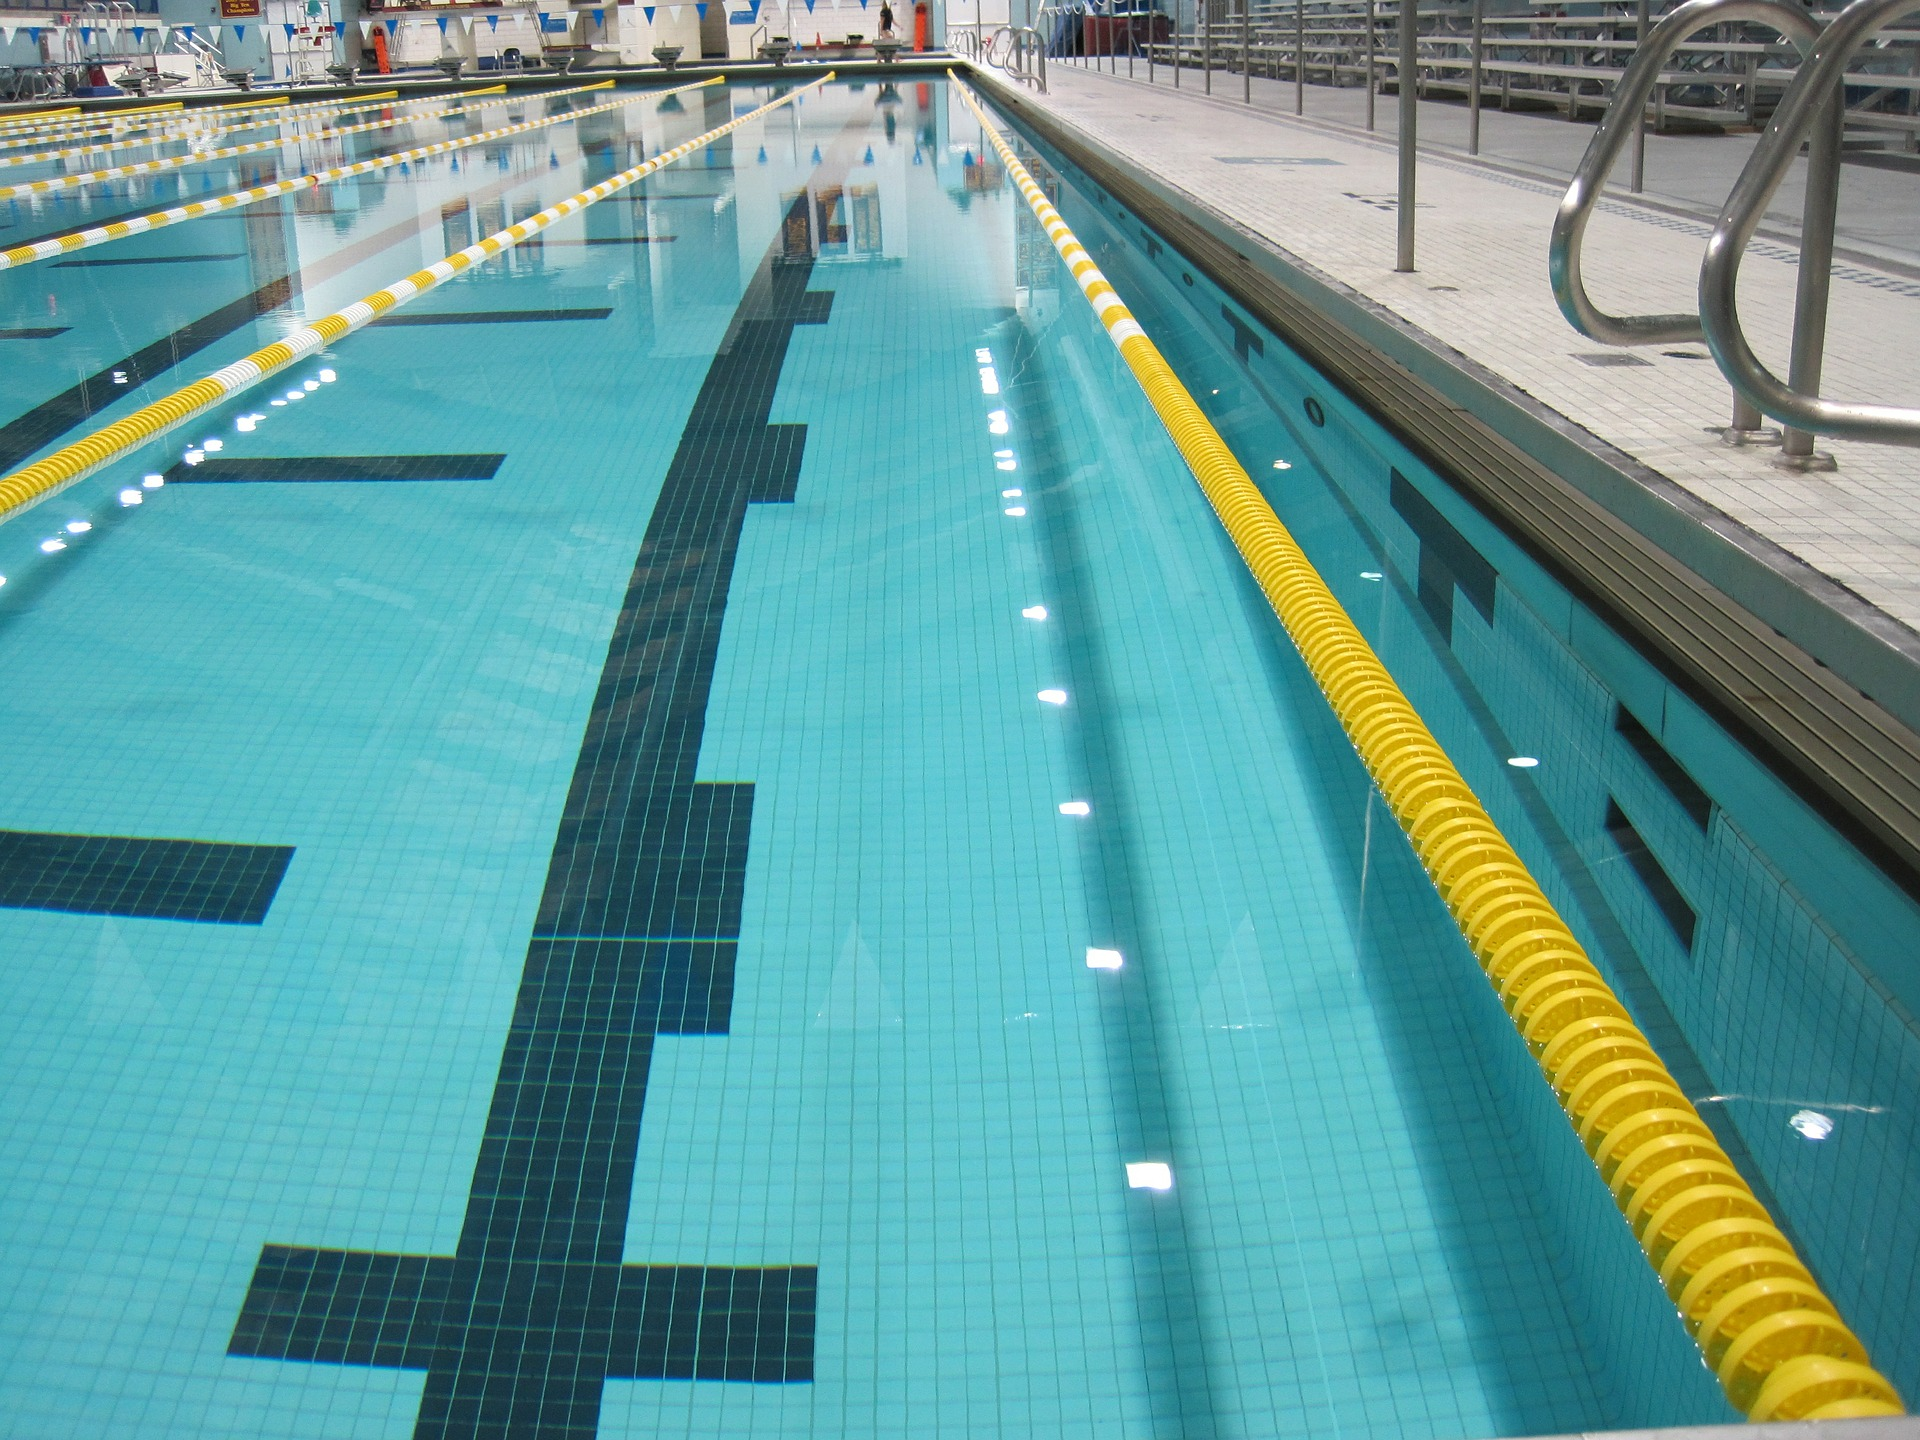 pool-545487_1920